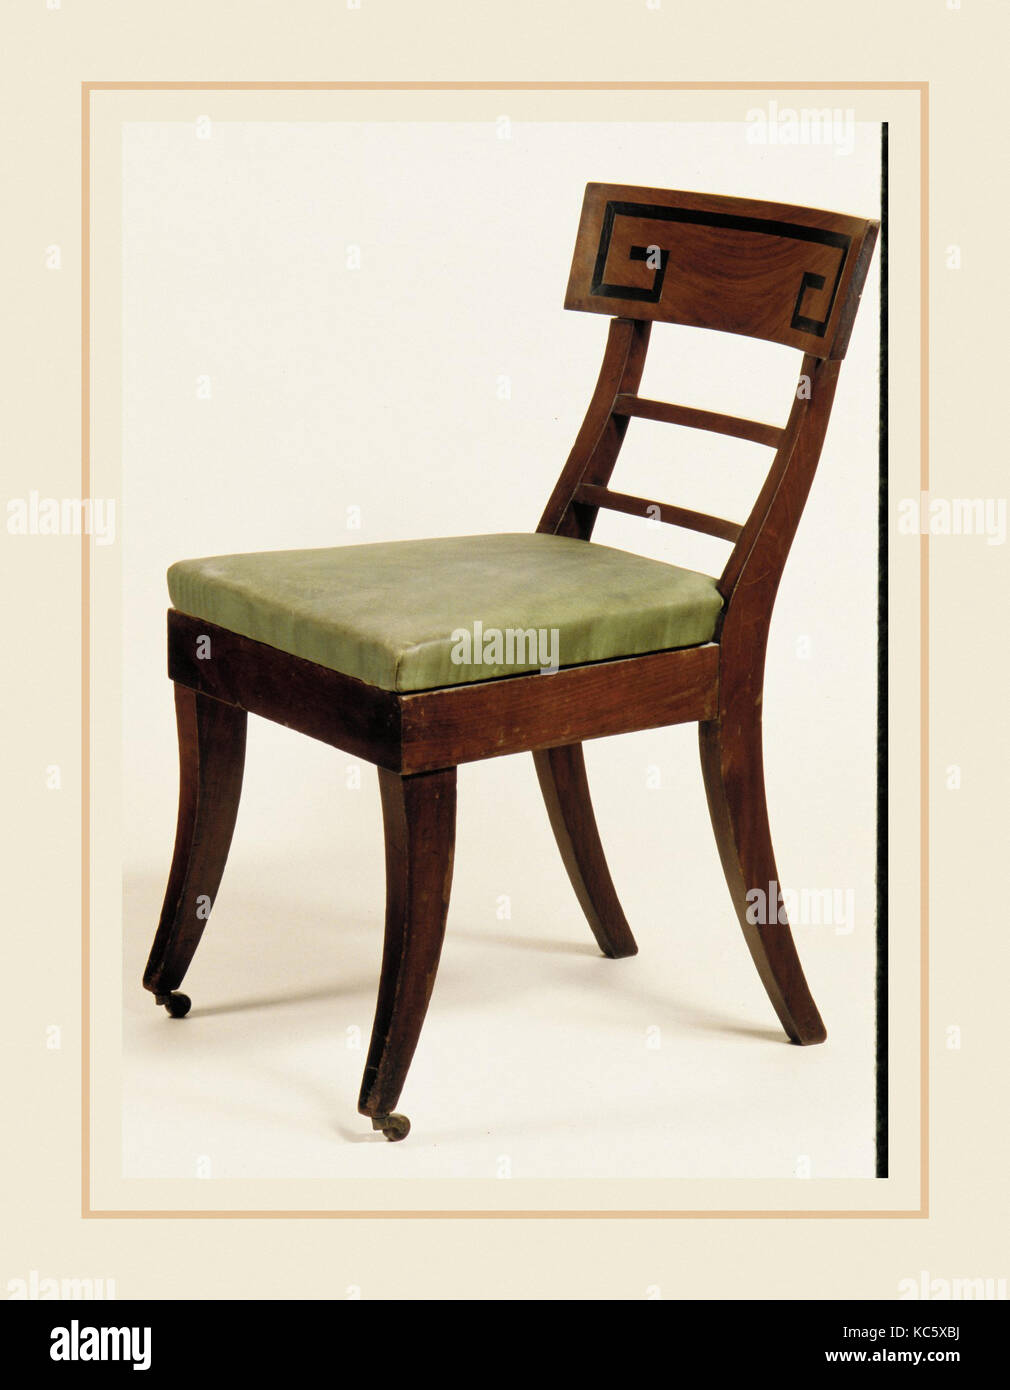 Chair mature ebony